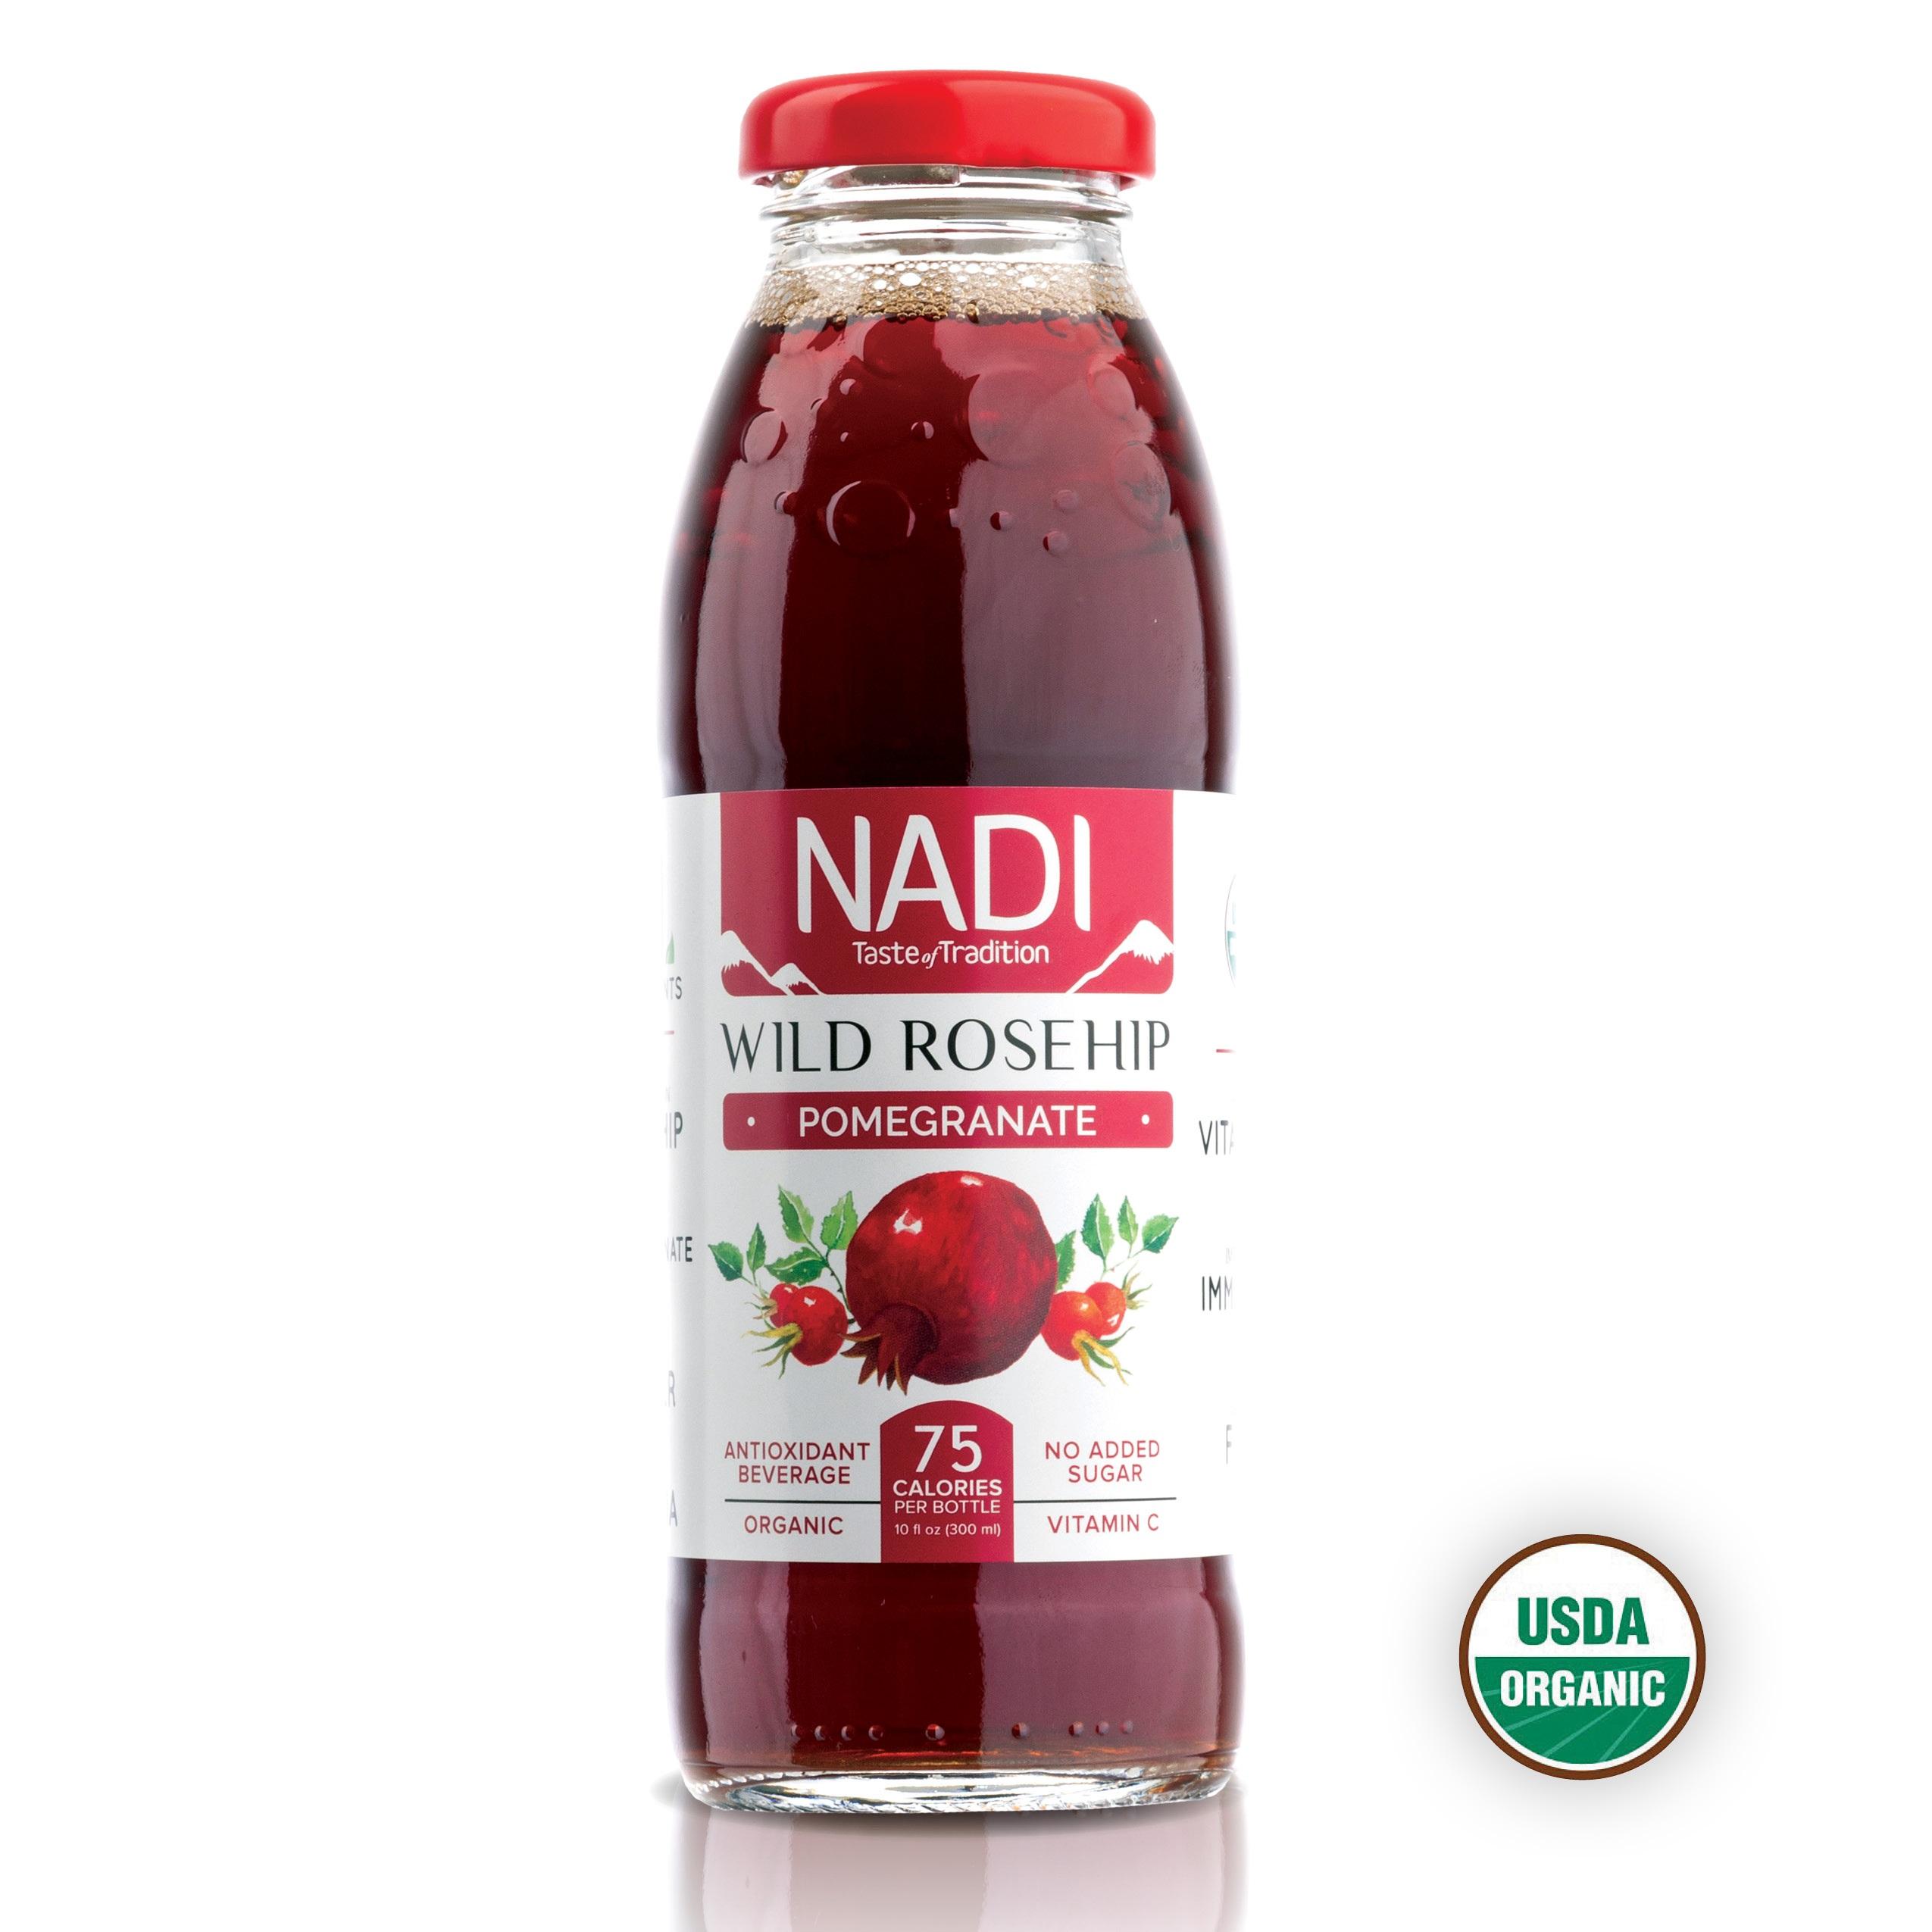 NADI: Photo of Organic Wild Rosehip Pomegranate Antioxidant Beverage - NADI (uploaded by company)